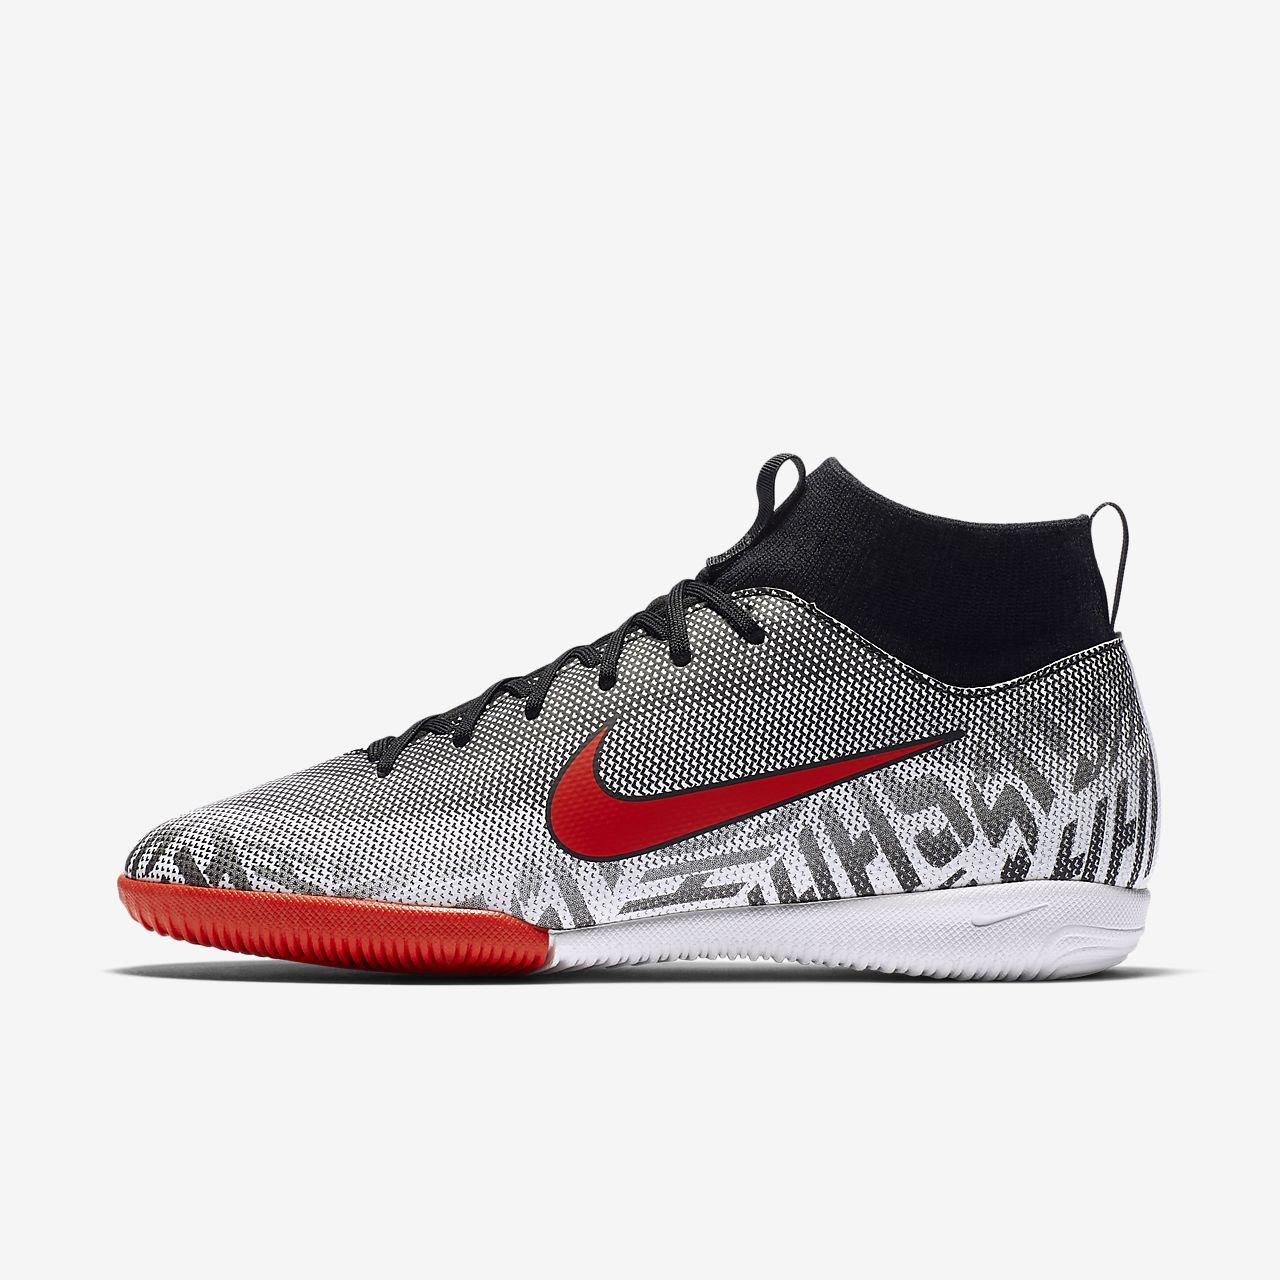 1b374669c14 Indoor Court Football Shoe. Nike Mercurial Superfly VI Academy Neymar Jr. IC